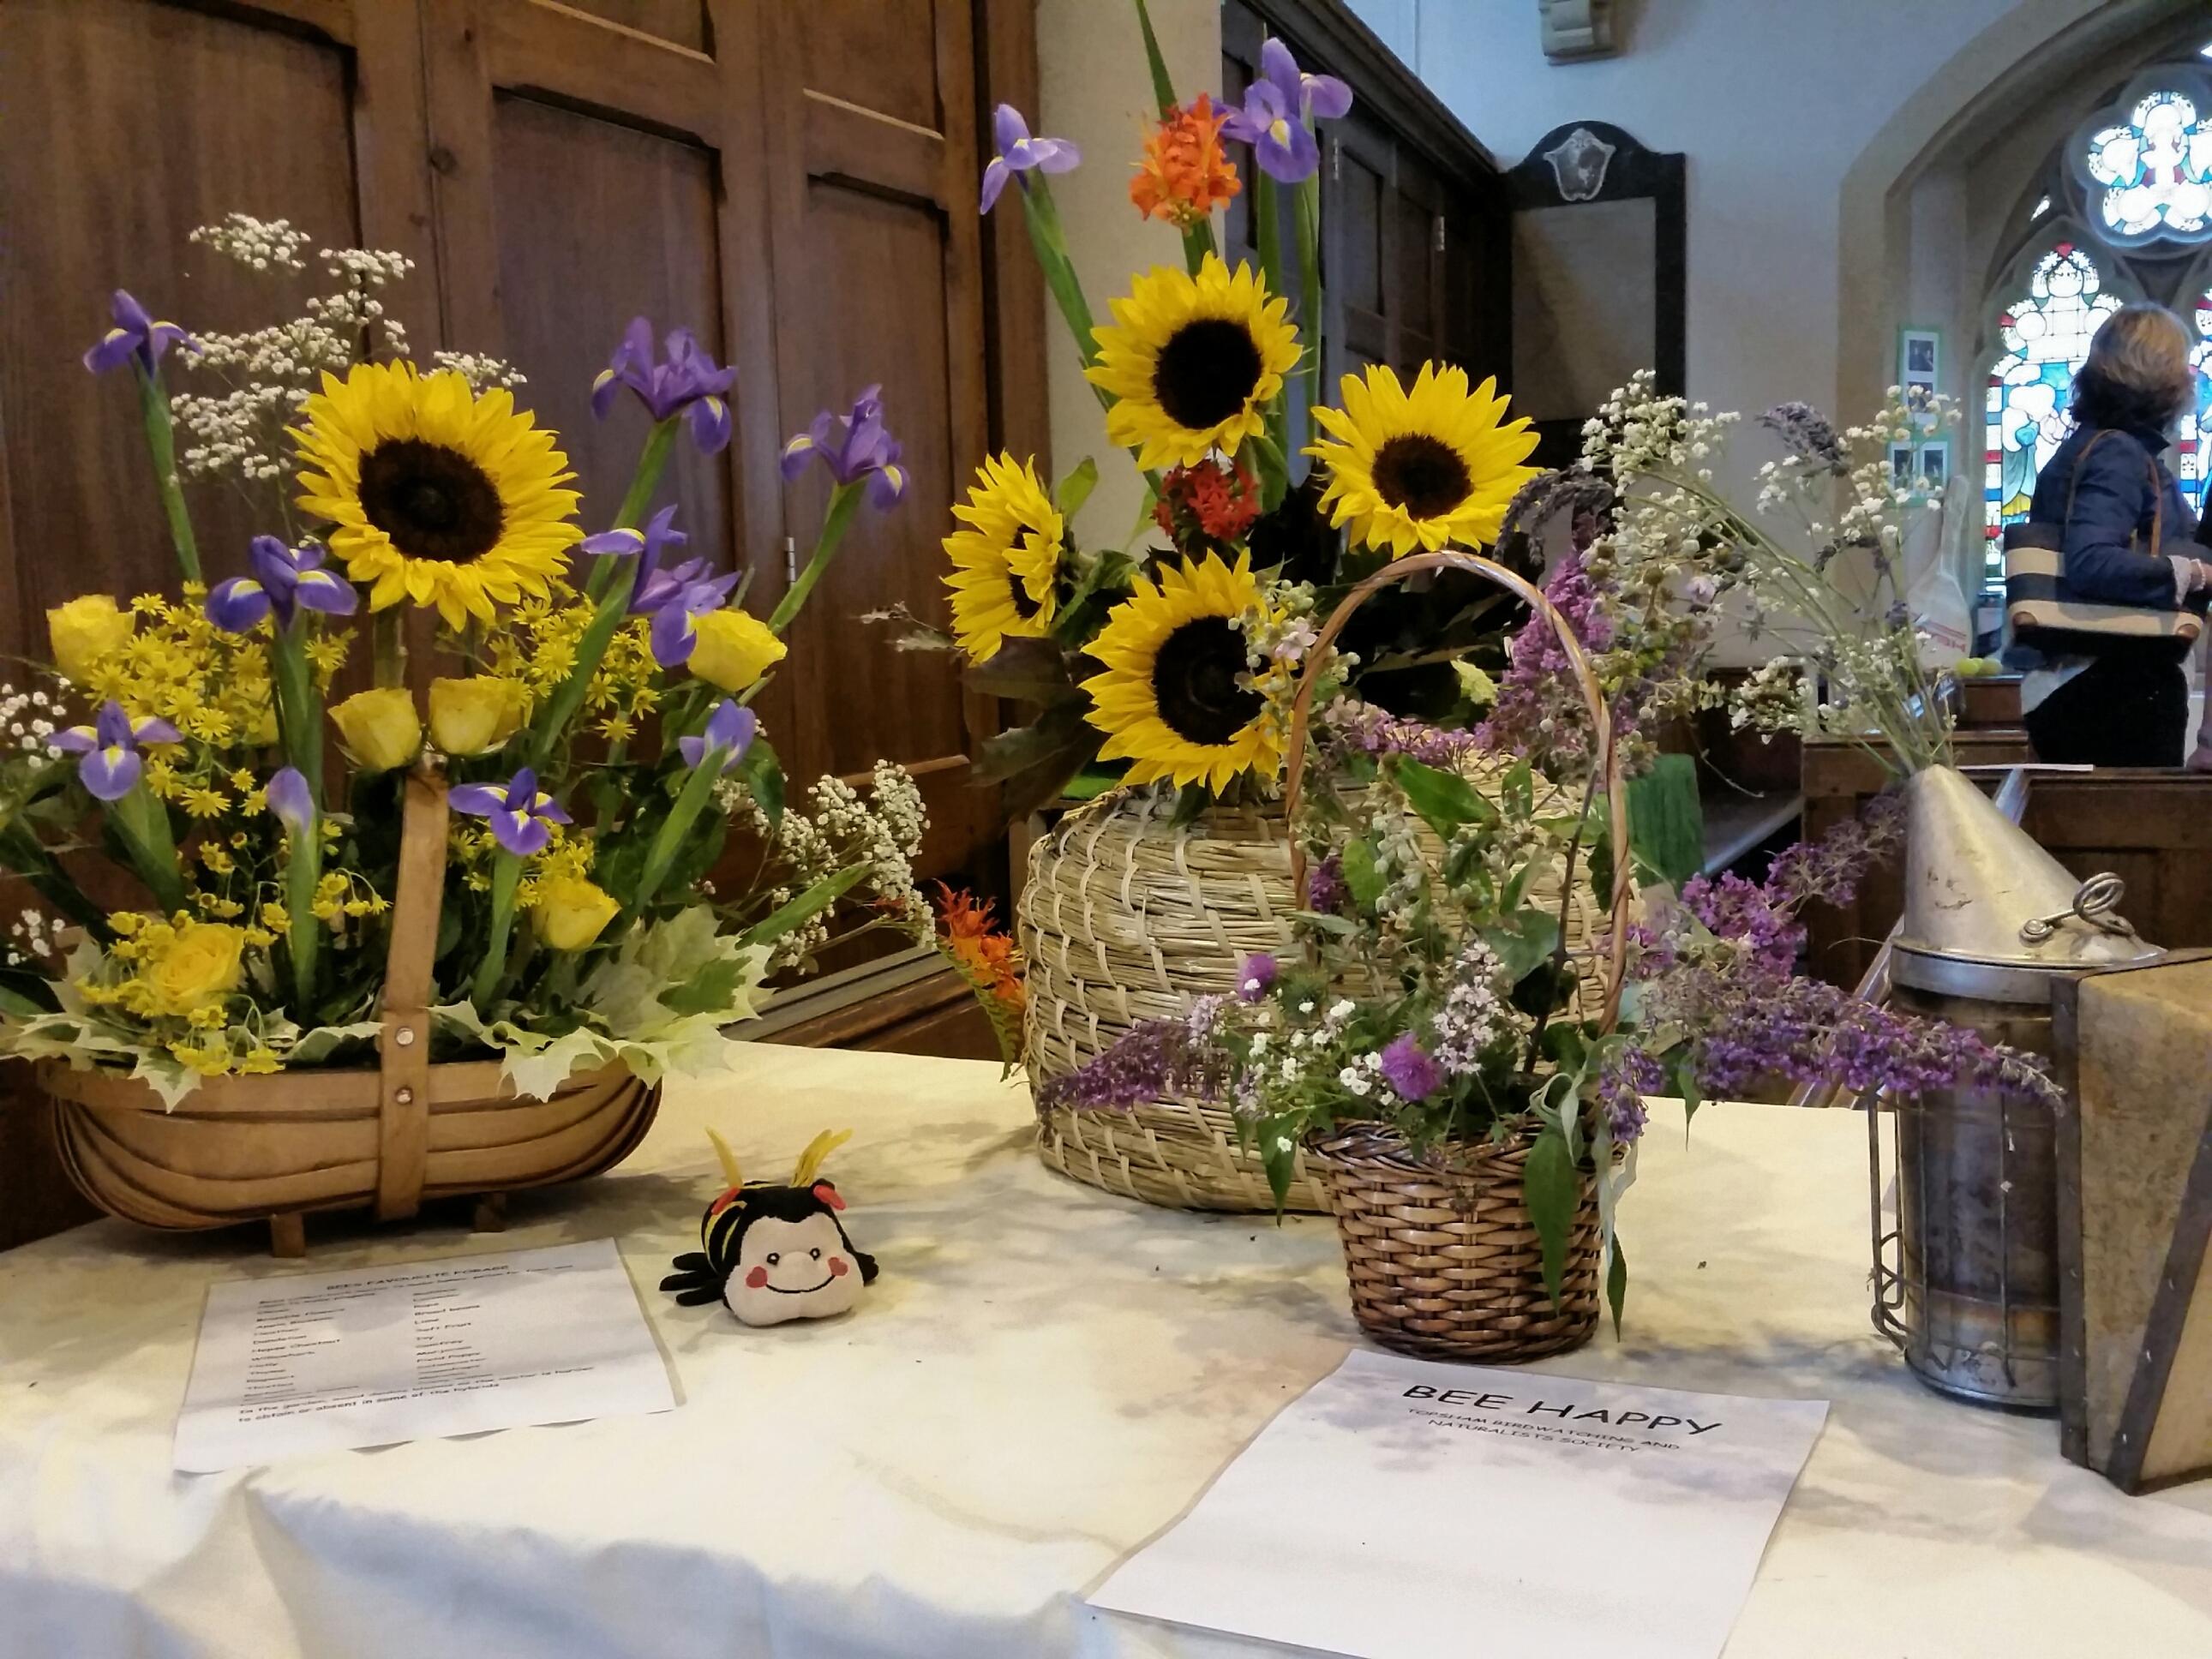 Topsham flower festival bee friendly plants